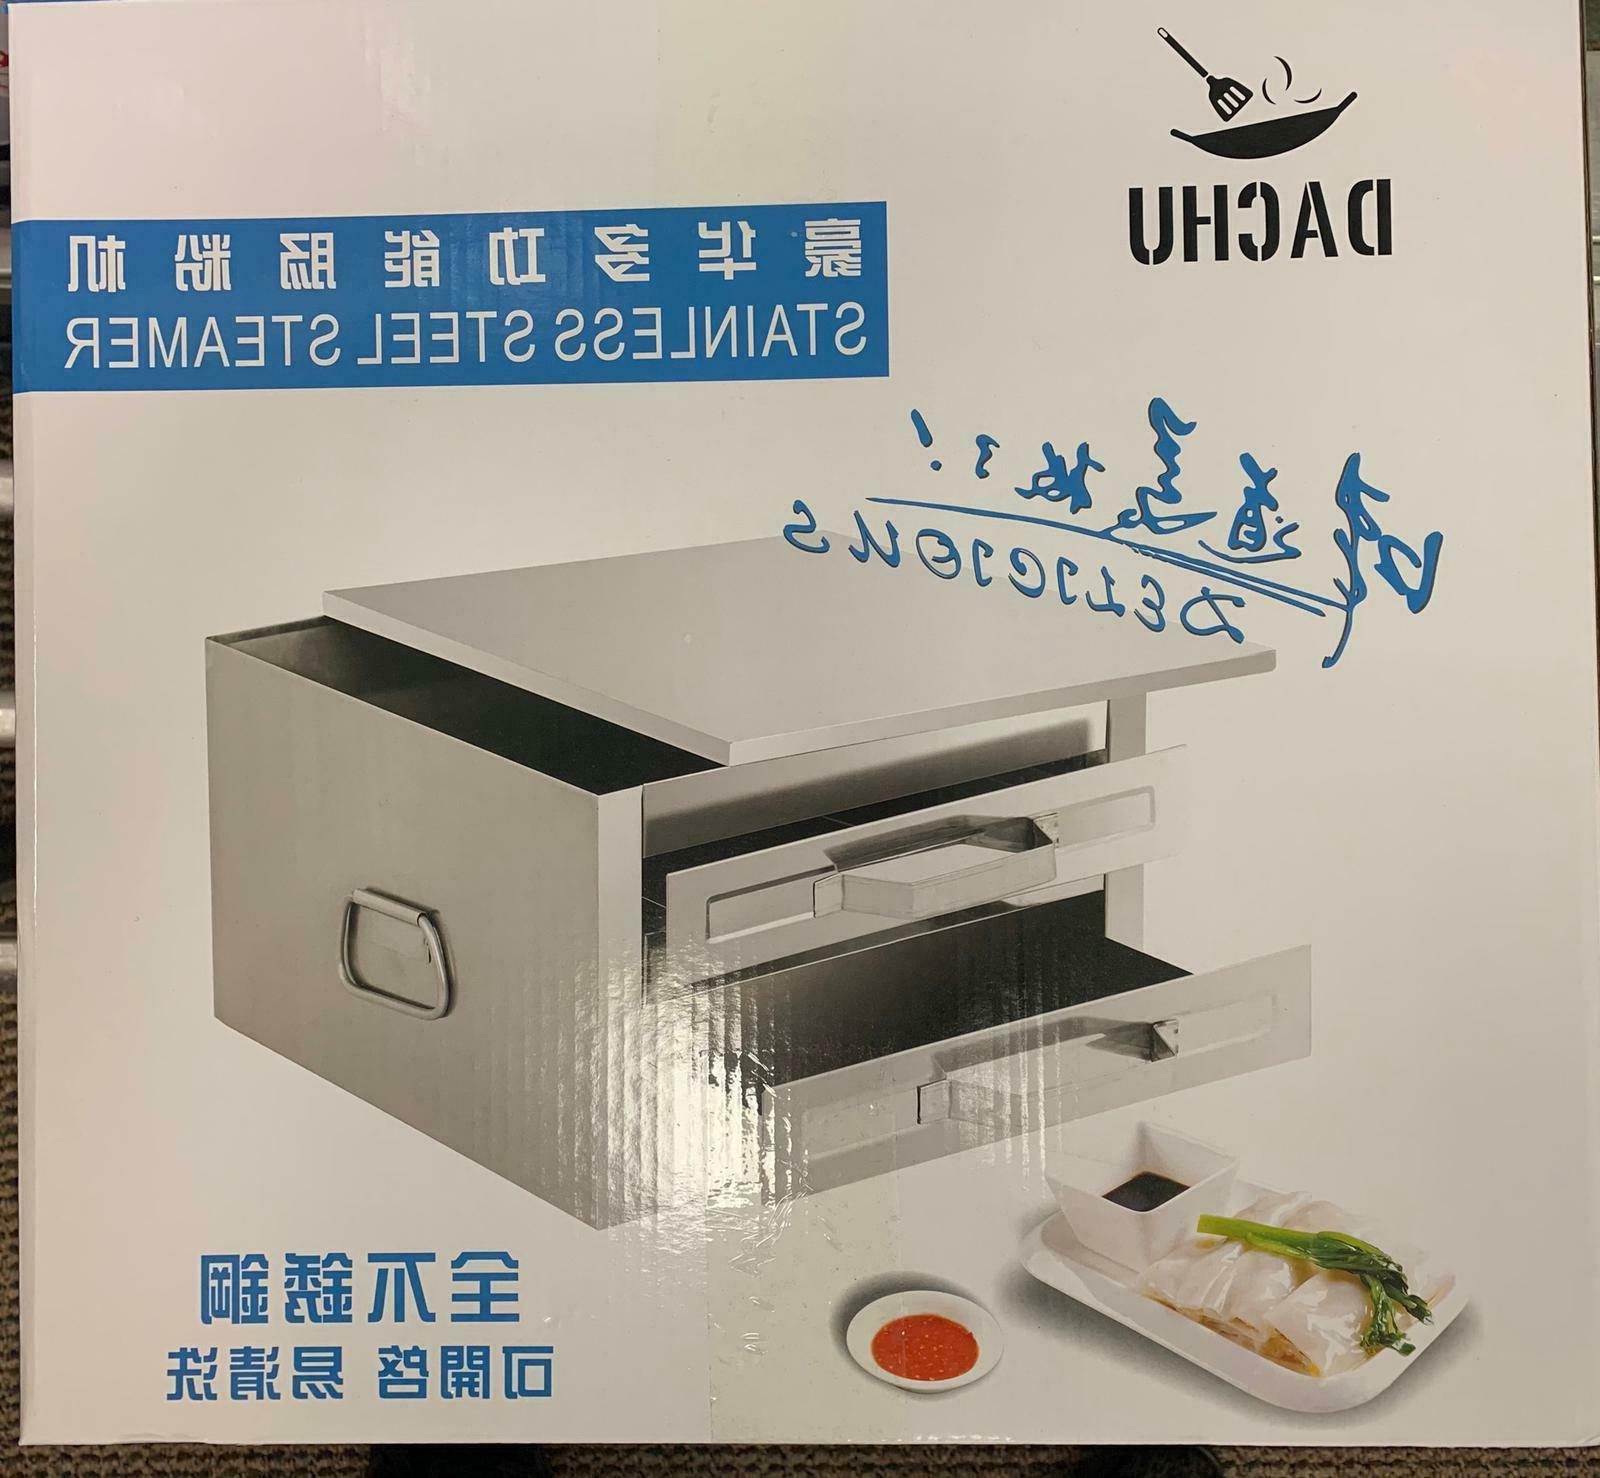 DaChu Steel Layer Rice Noodle Steamer, machine